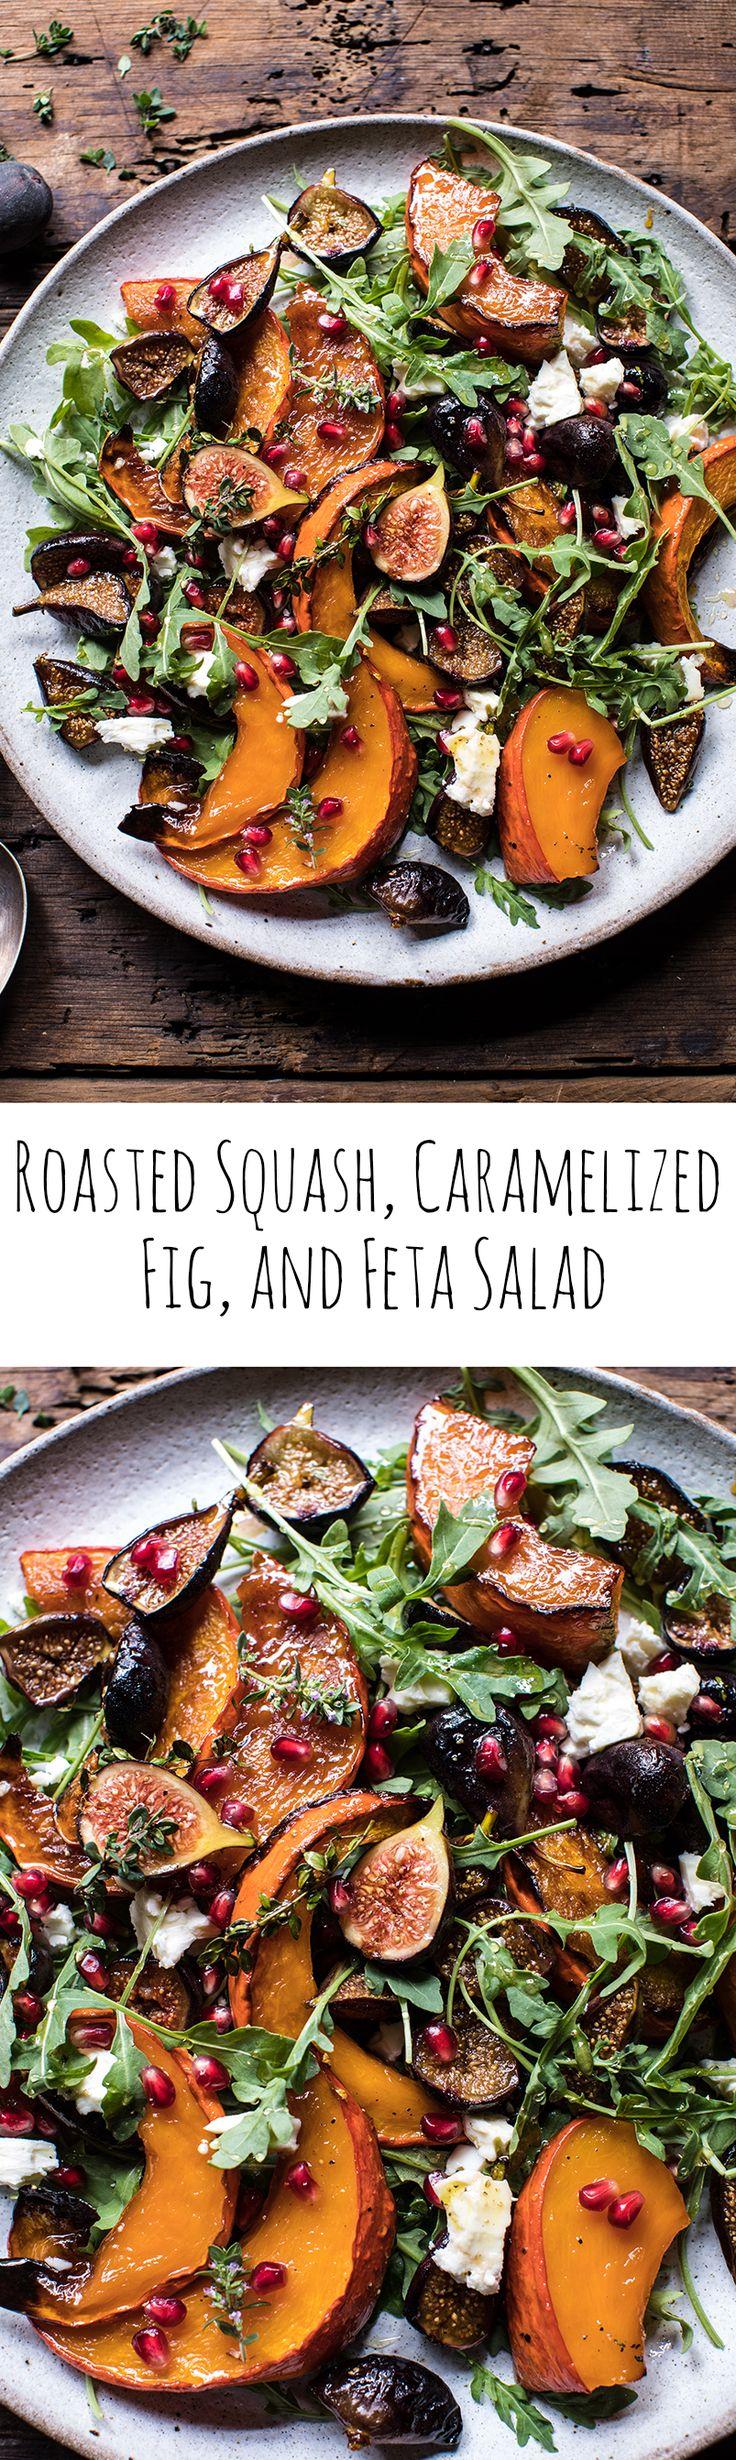 Roasted Squash, Caramelized Fig, and Feta Salad | halfbakedharvest.com @hbharvest